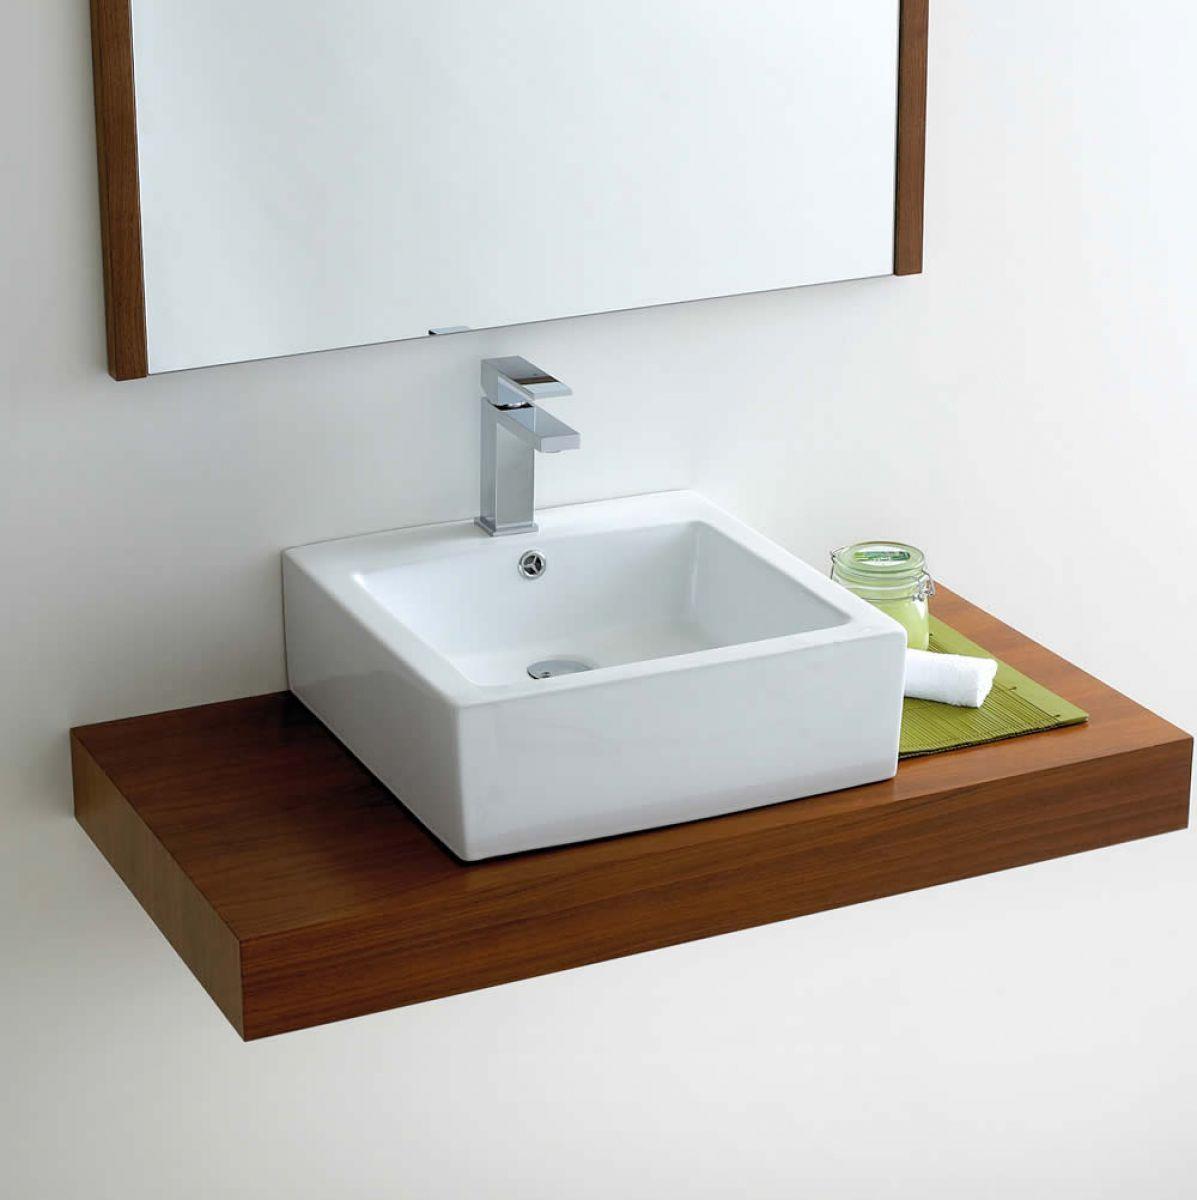 Delphine Marble Oval Vessel Sink Bathroom Sink Vessel Sinks Bathroom Sink